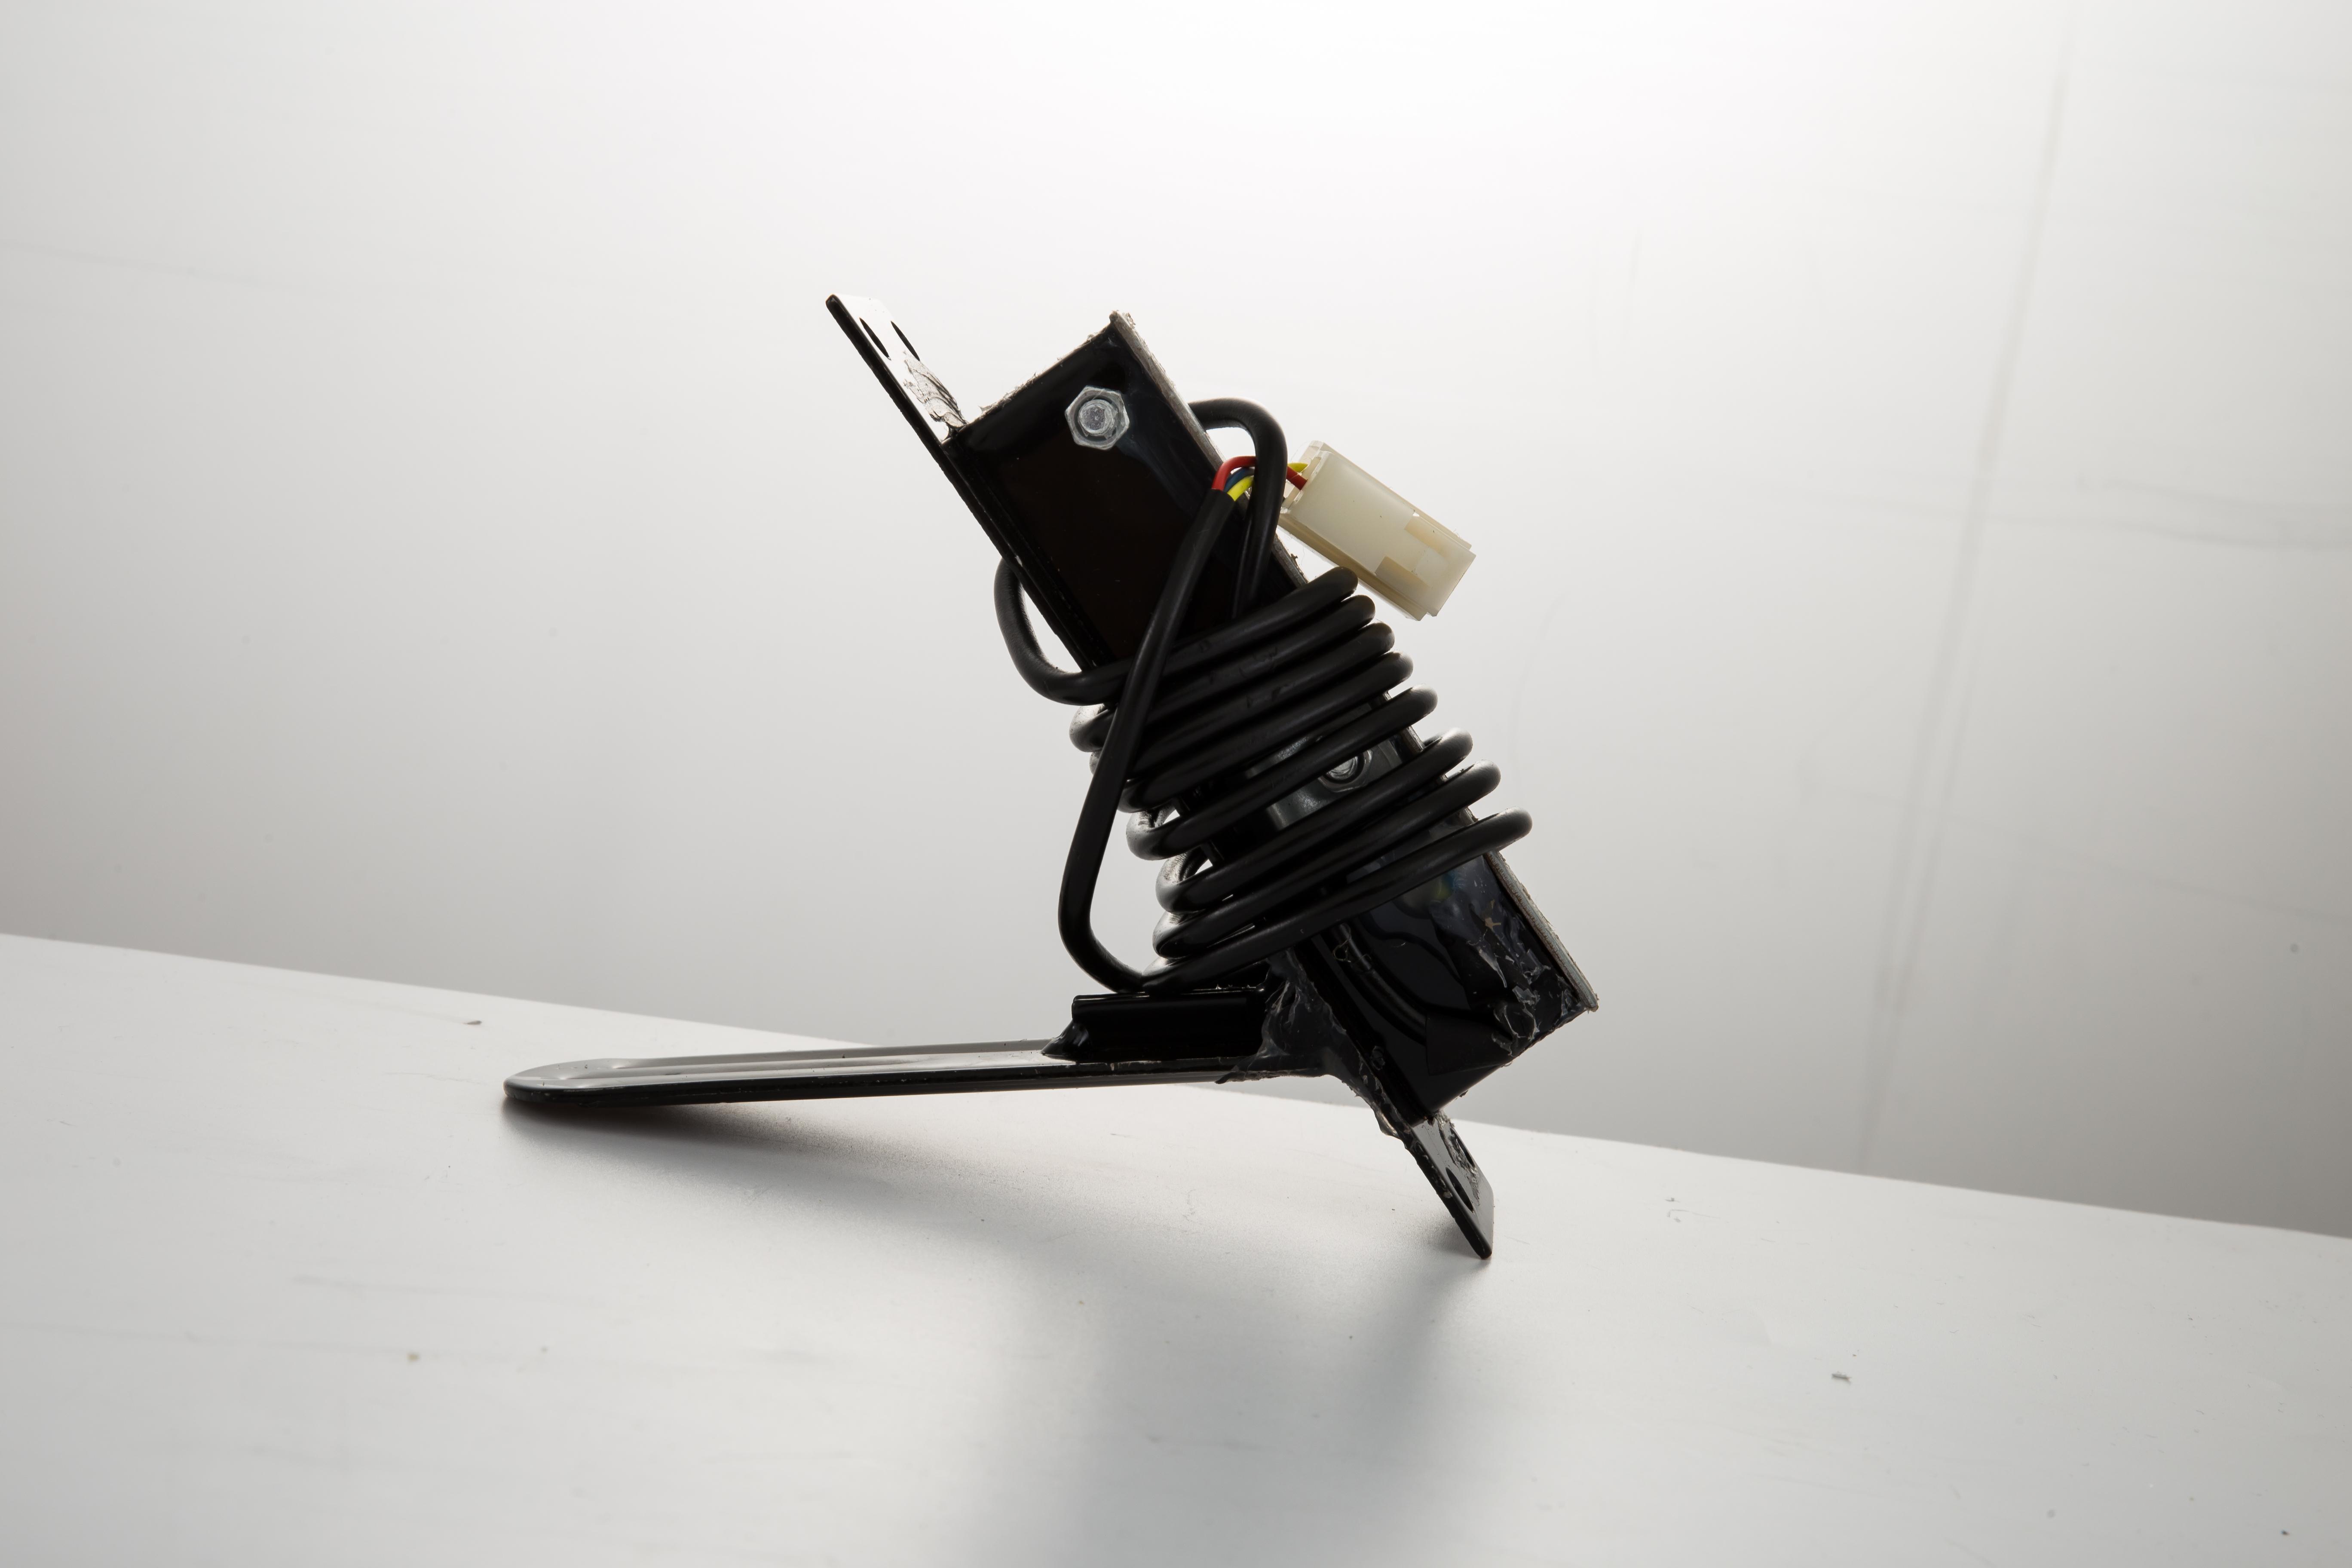 36v-Electric-Motor-controller-throttle-kit-f-Scooter-E-Scooter-ATV-Permanent thumbnail 140